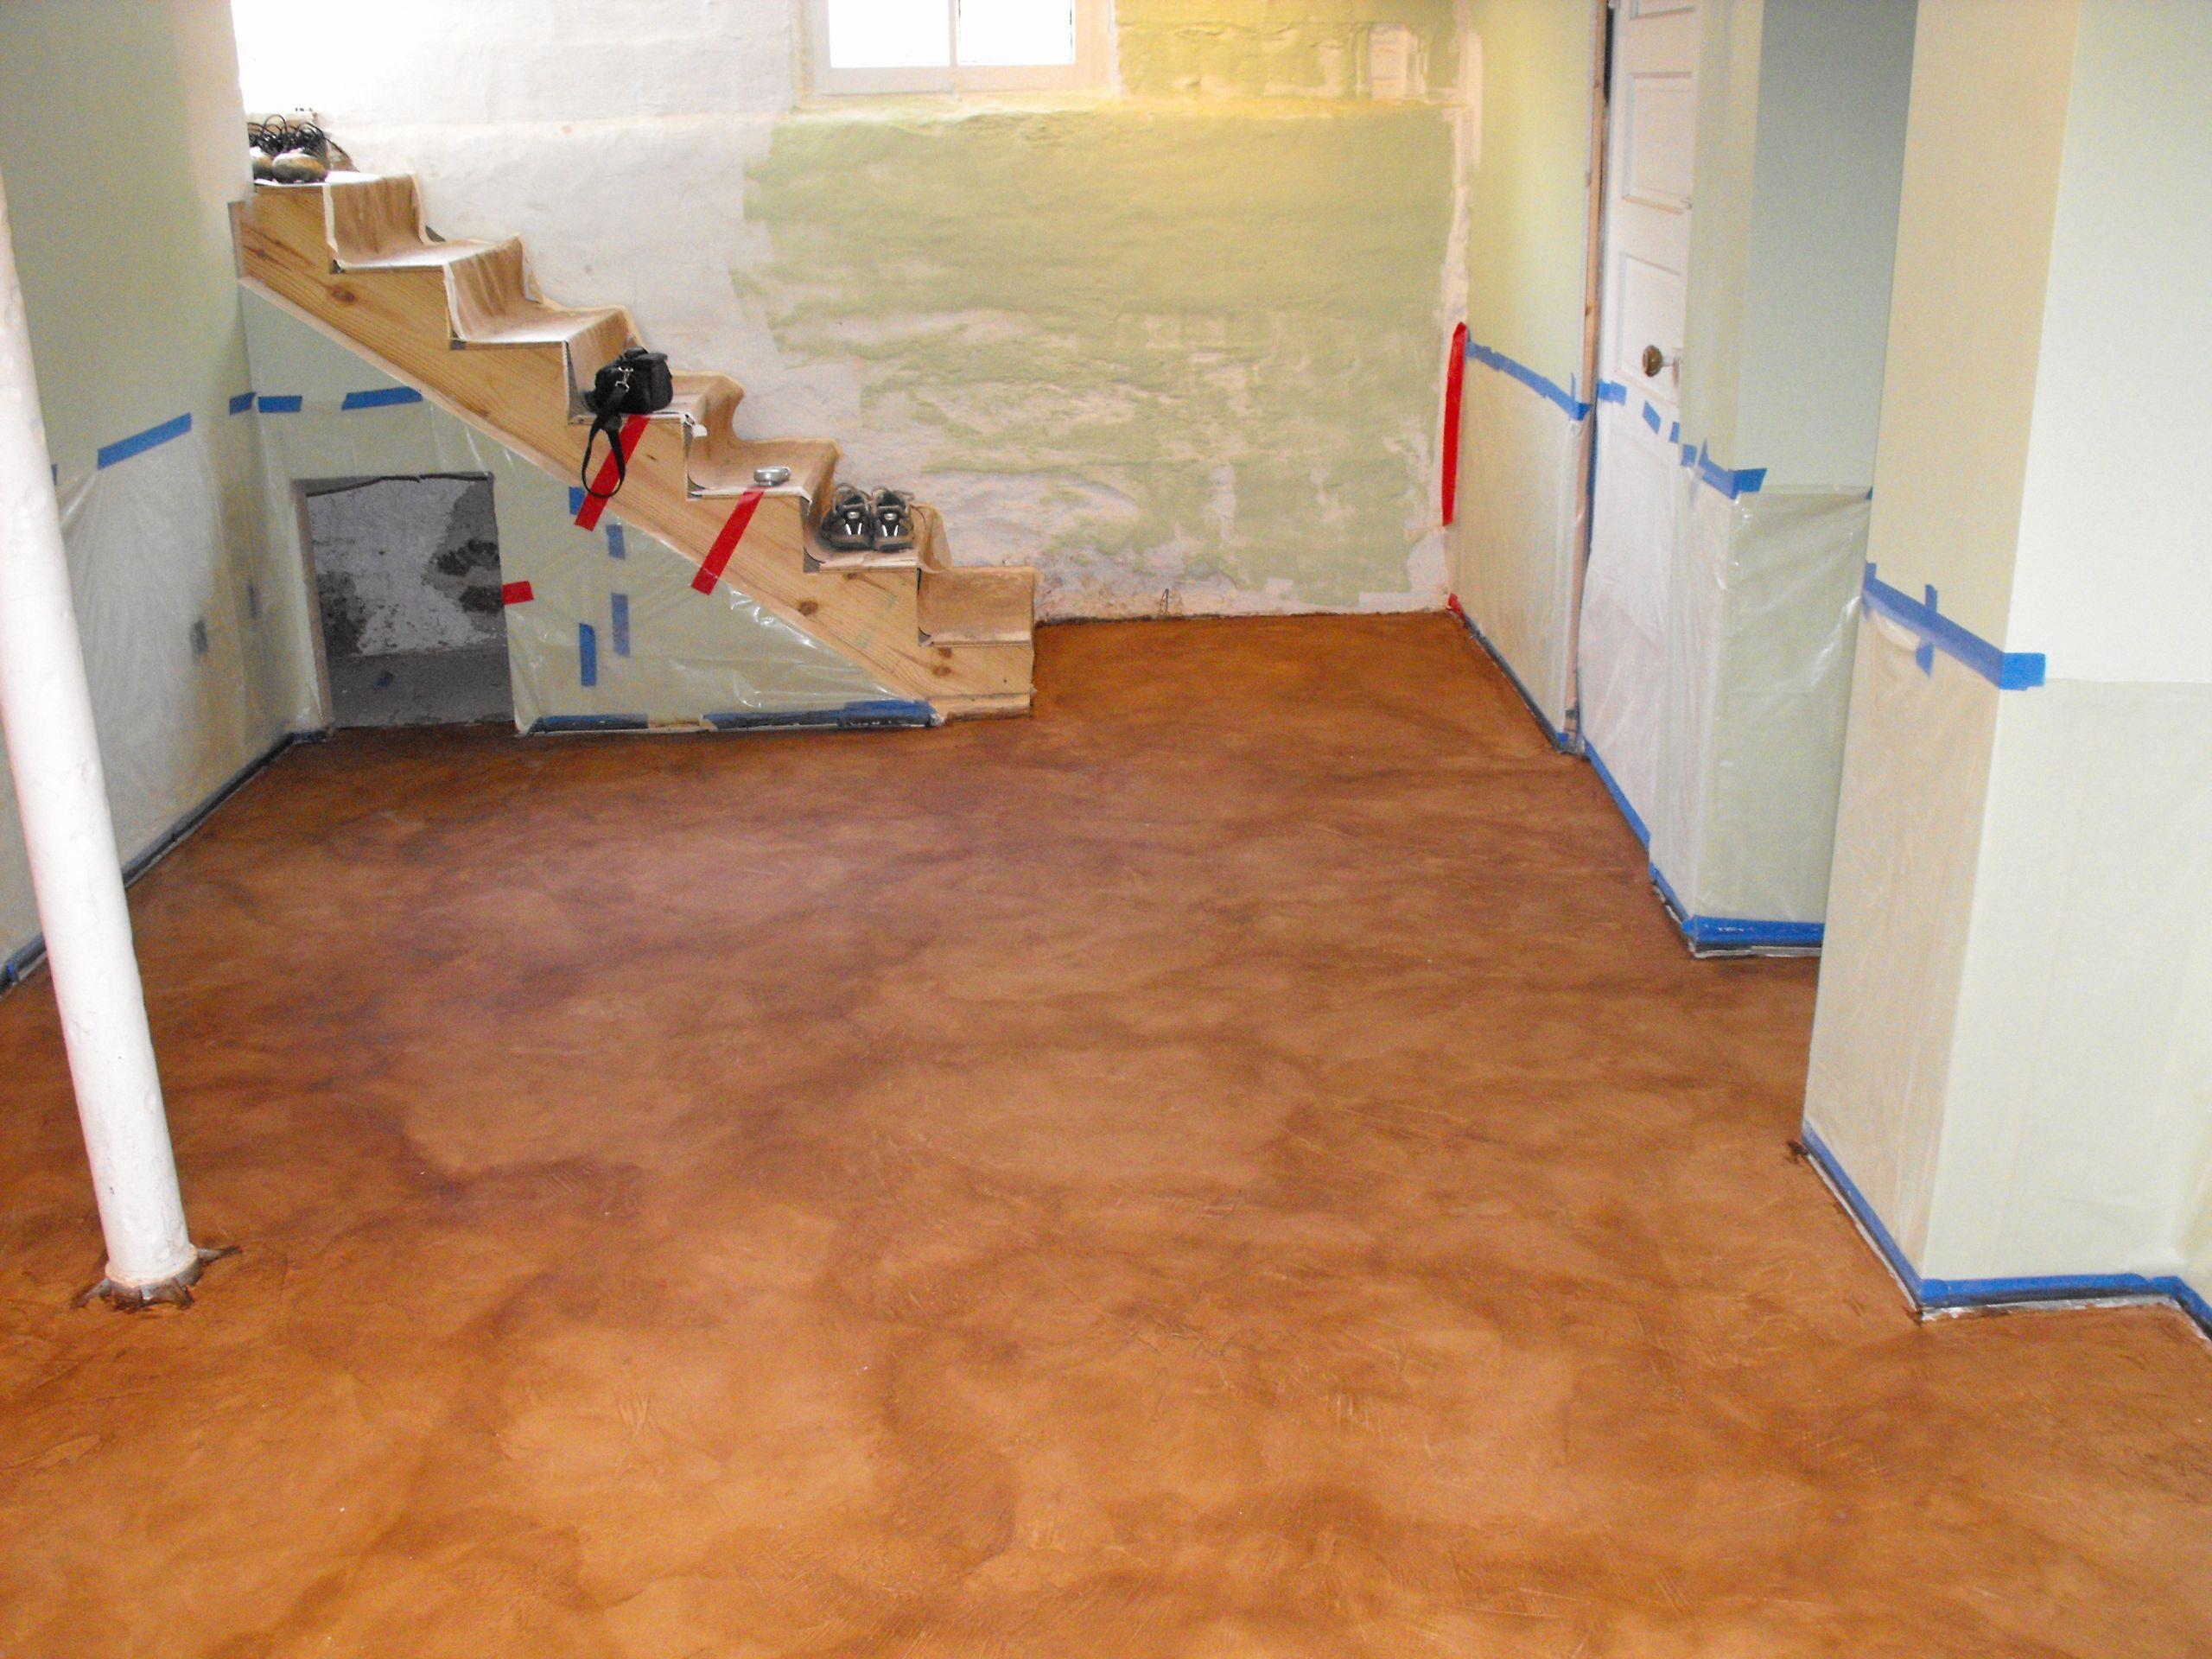 7 New Basement Floor Ideas Hardwood On Concrete Basement Floor Of Paint Basement Floor Concre In 2020 Painted Concrete Floors Flooring Basement Flooring Options